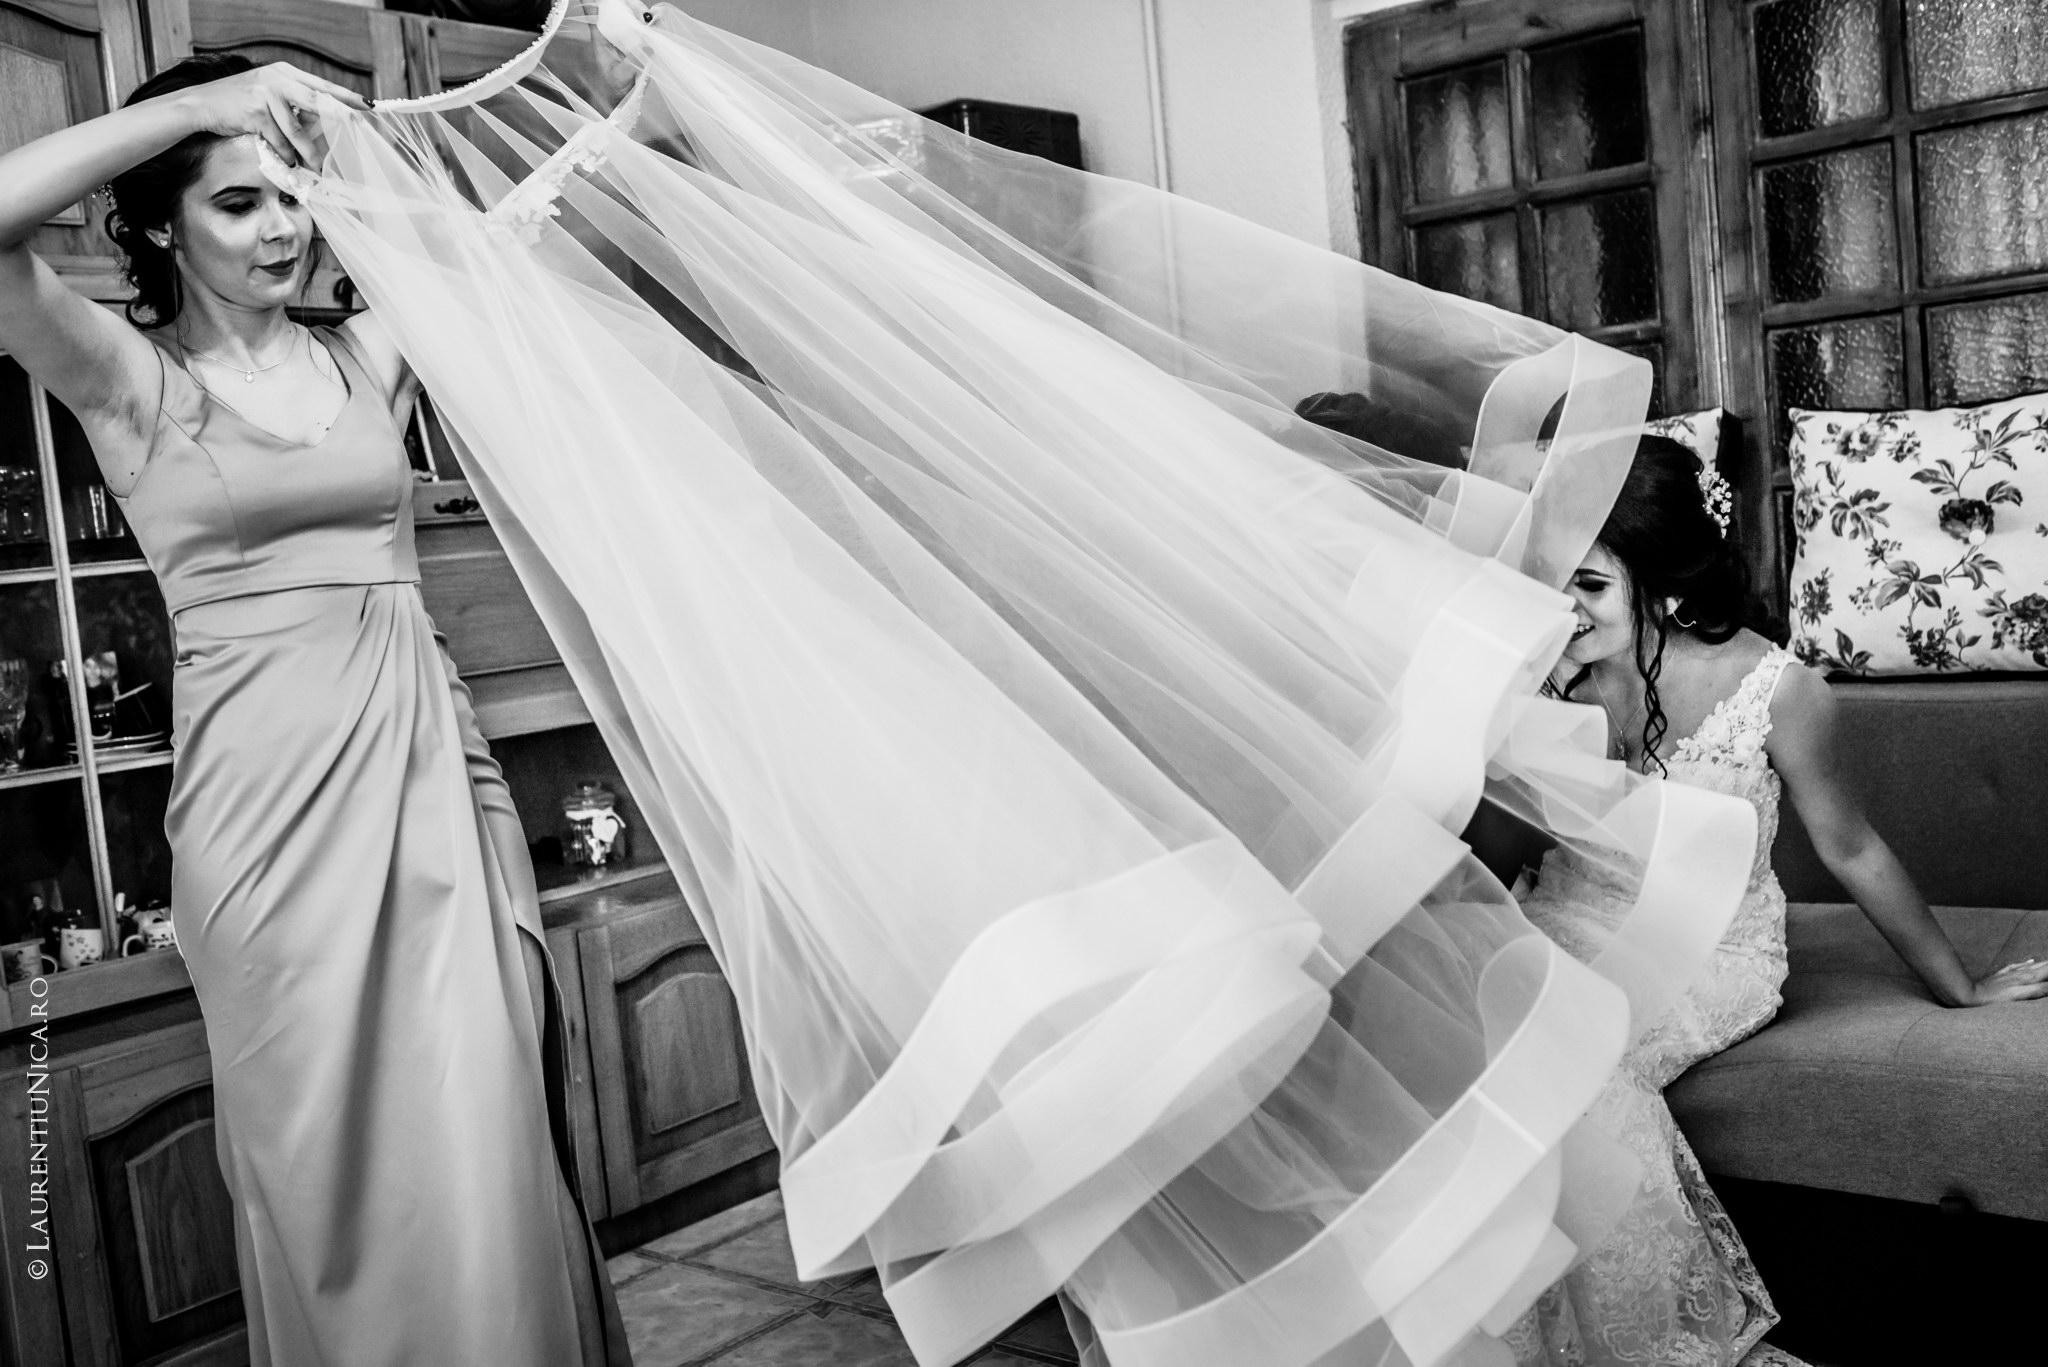 fotografii nunta craiova bia alex fotograf nunta laurentiu nica 14 - Bia & Alex | Fotografii nunta | Craiova